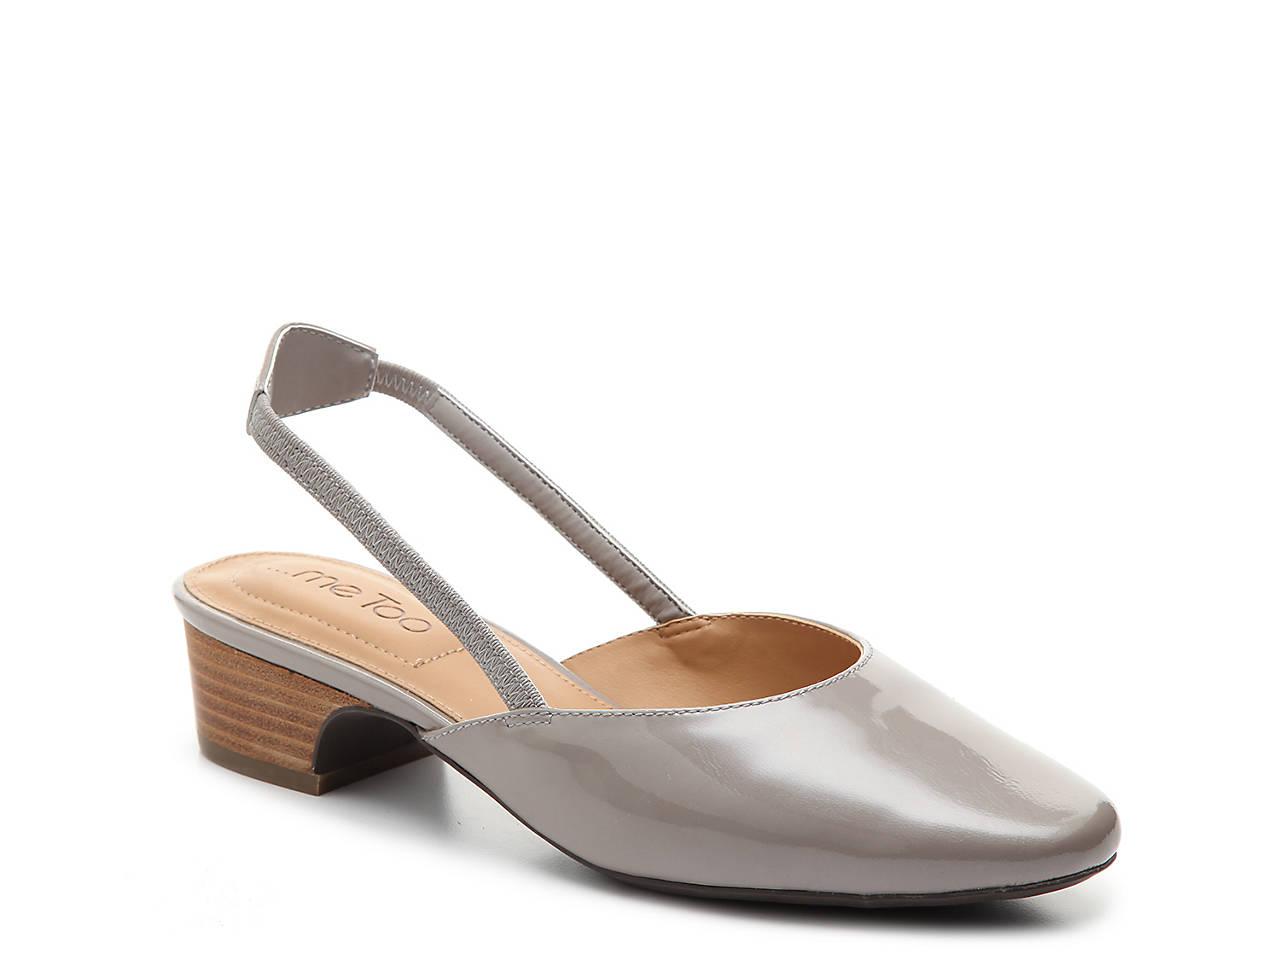 97bd42ca002 Me Too Gianna Pump Women s Shoes